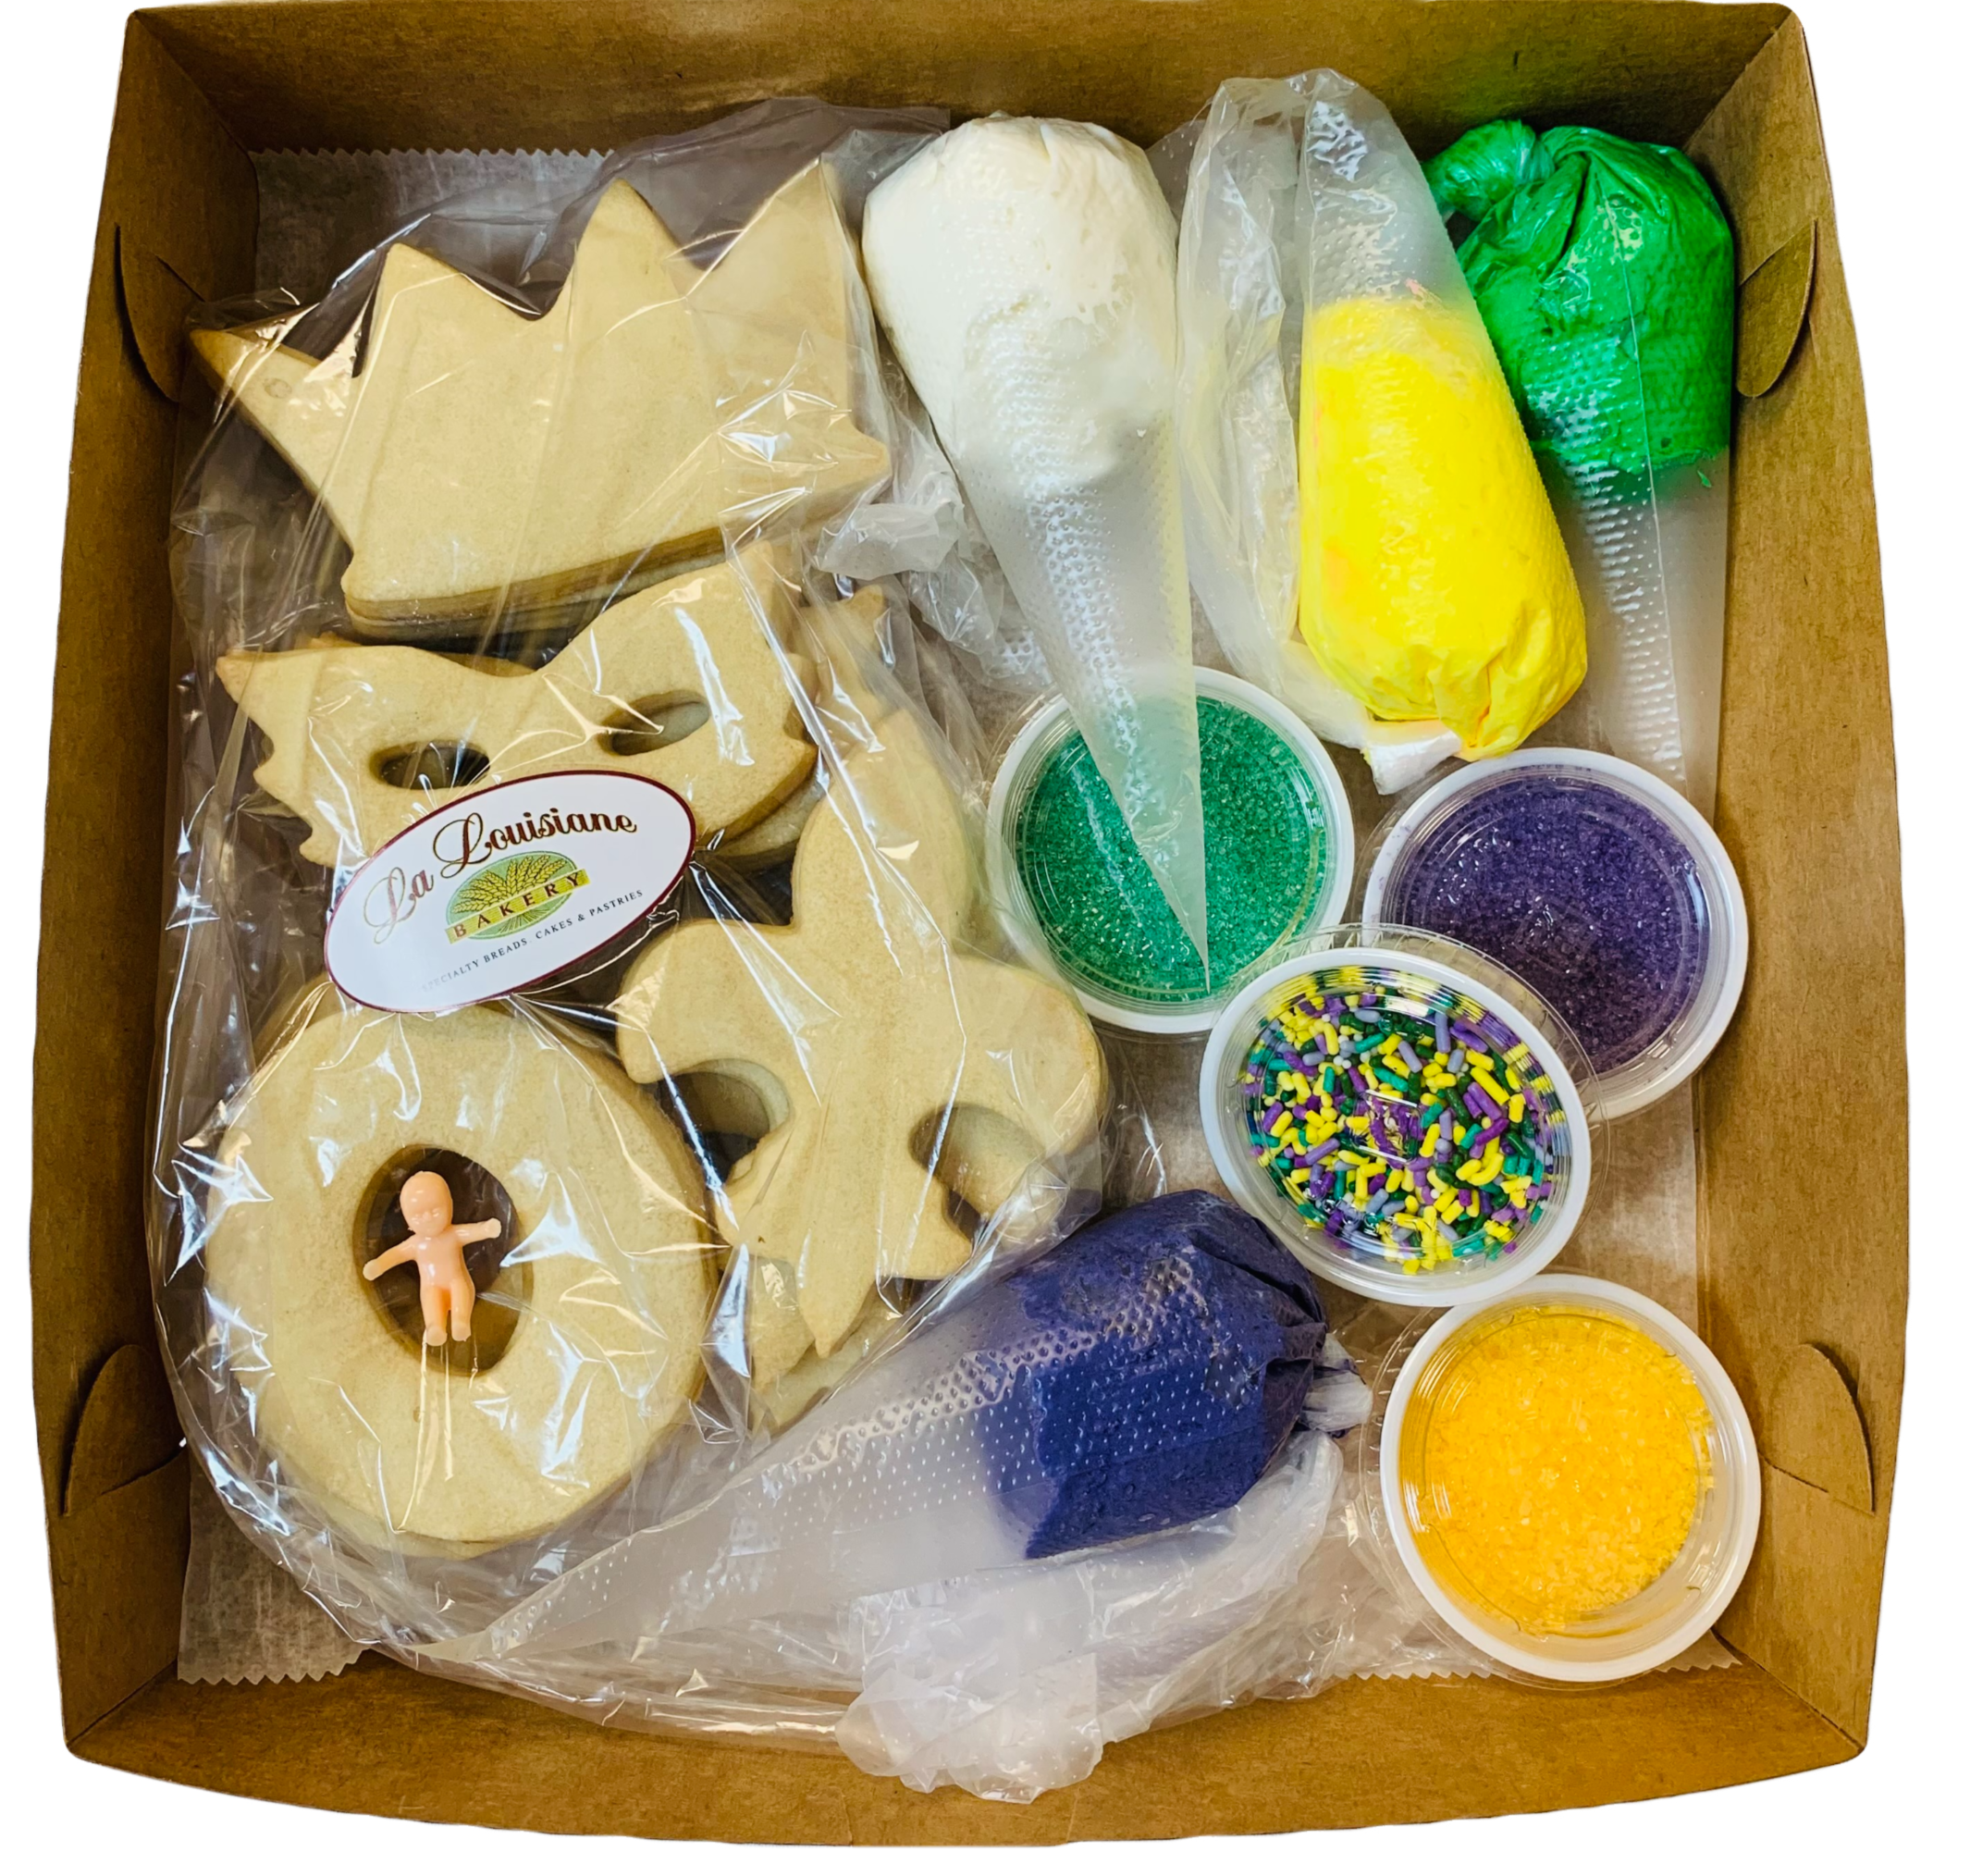 Mardi Gras Cookie Decorating Kit